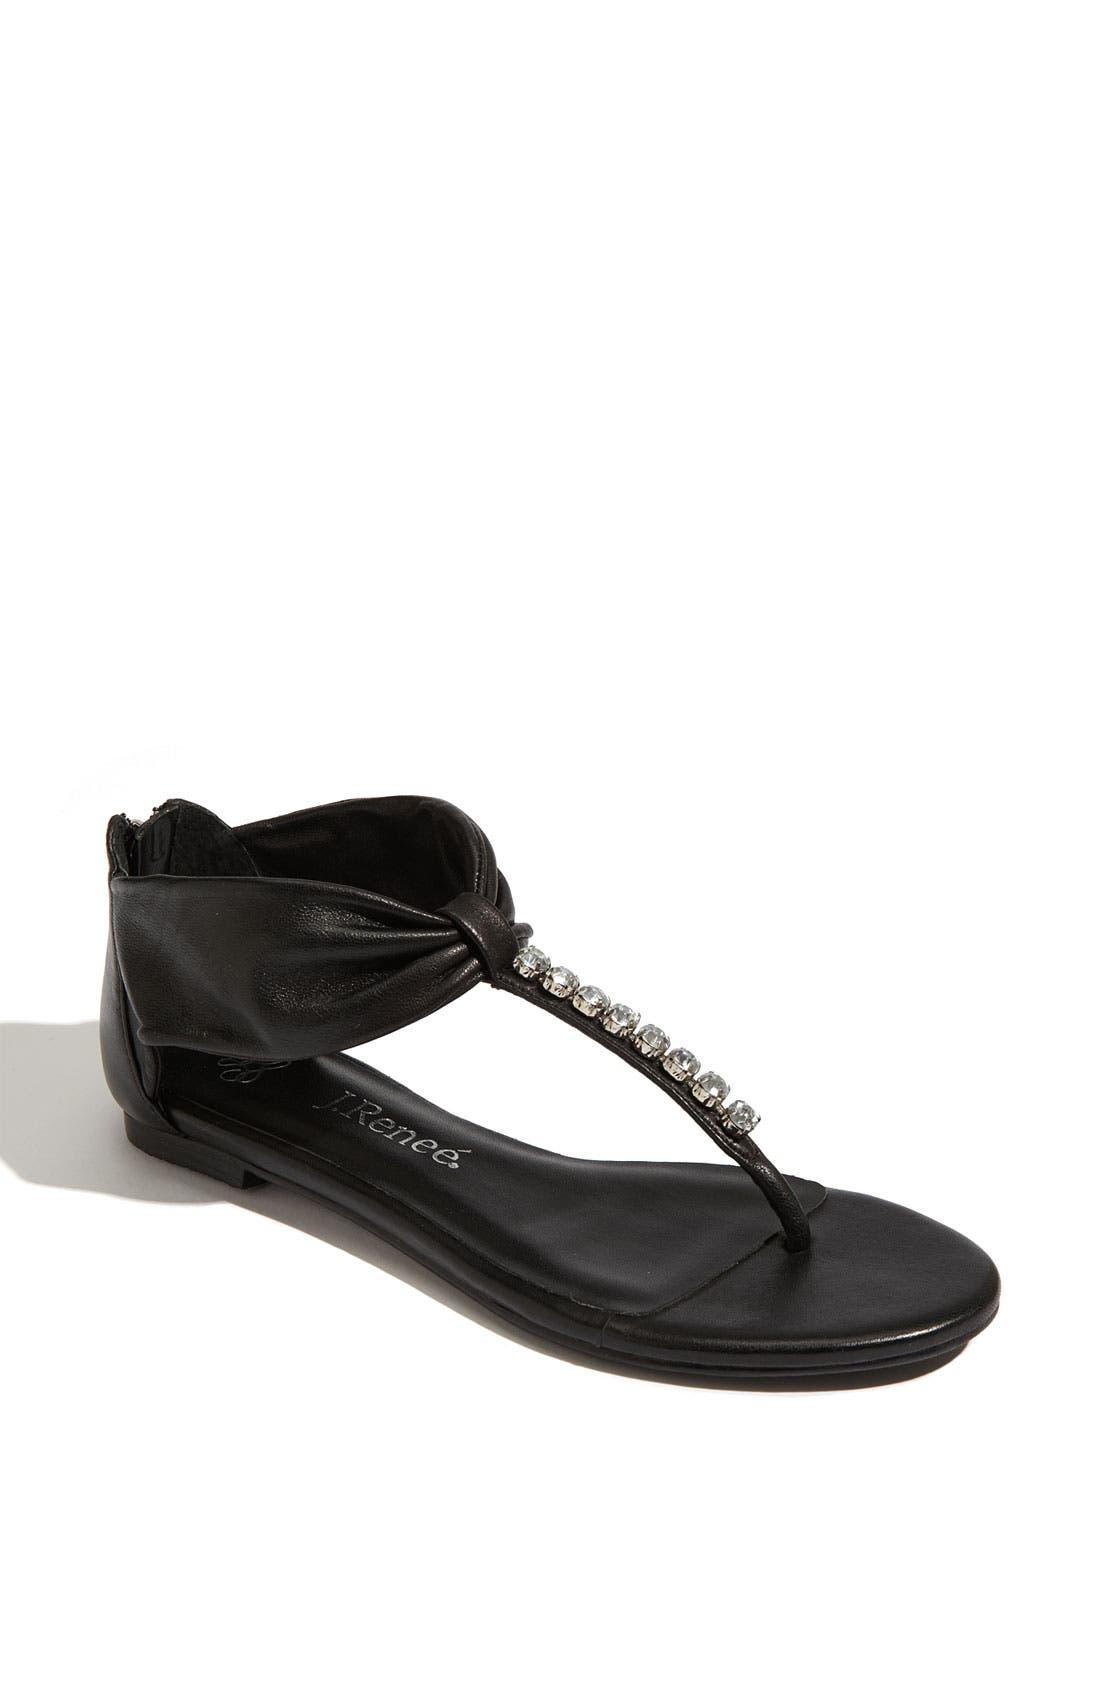 'Spruce' Sandal, Main, color, 001